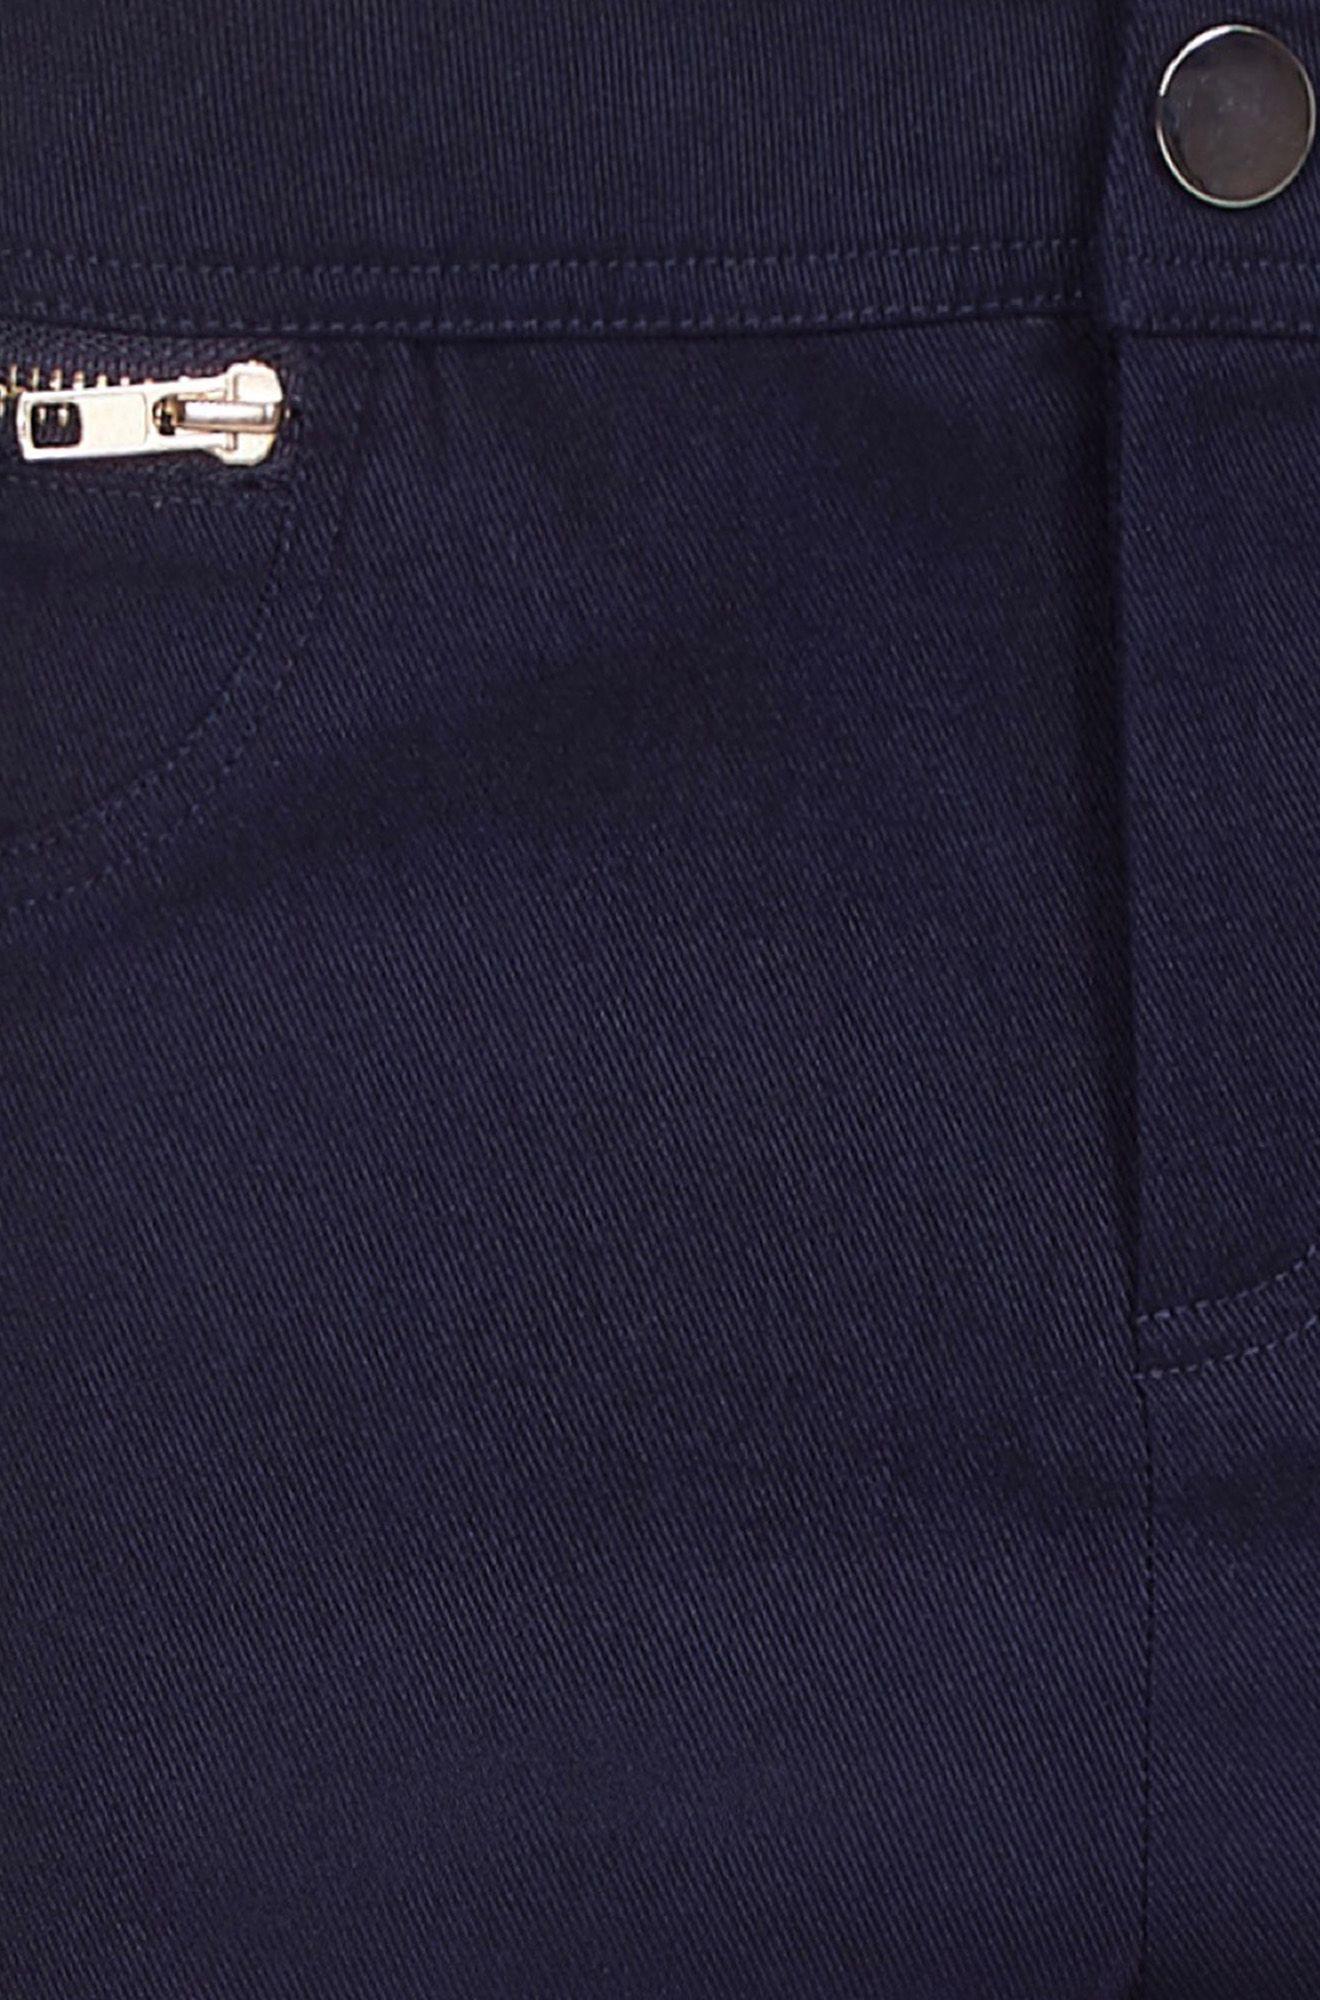 Zip Pocket Navy Jegging